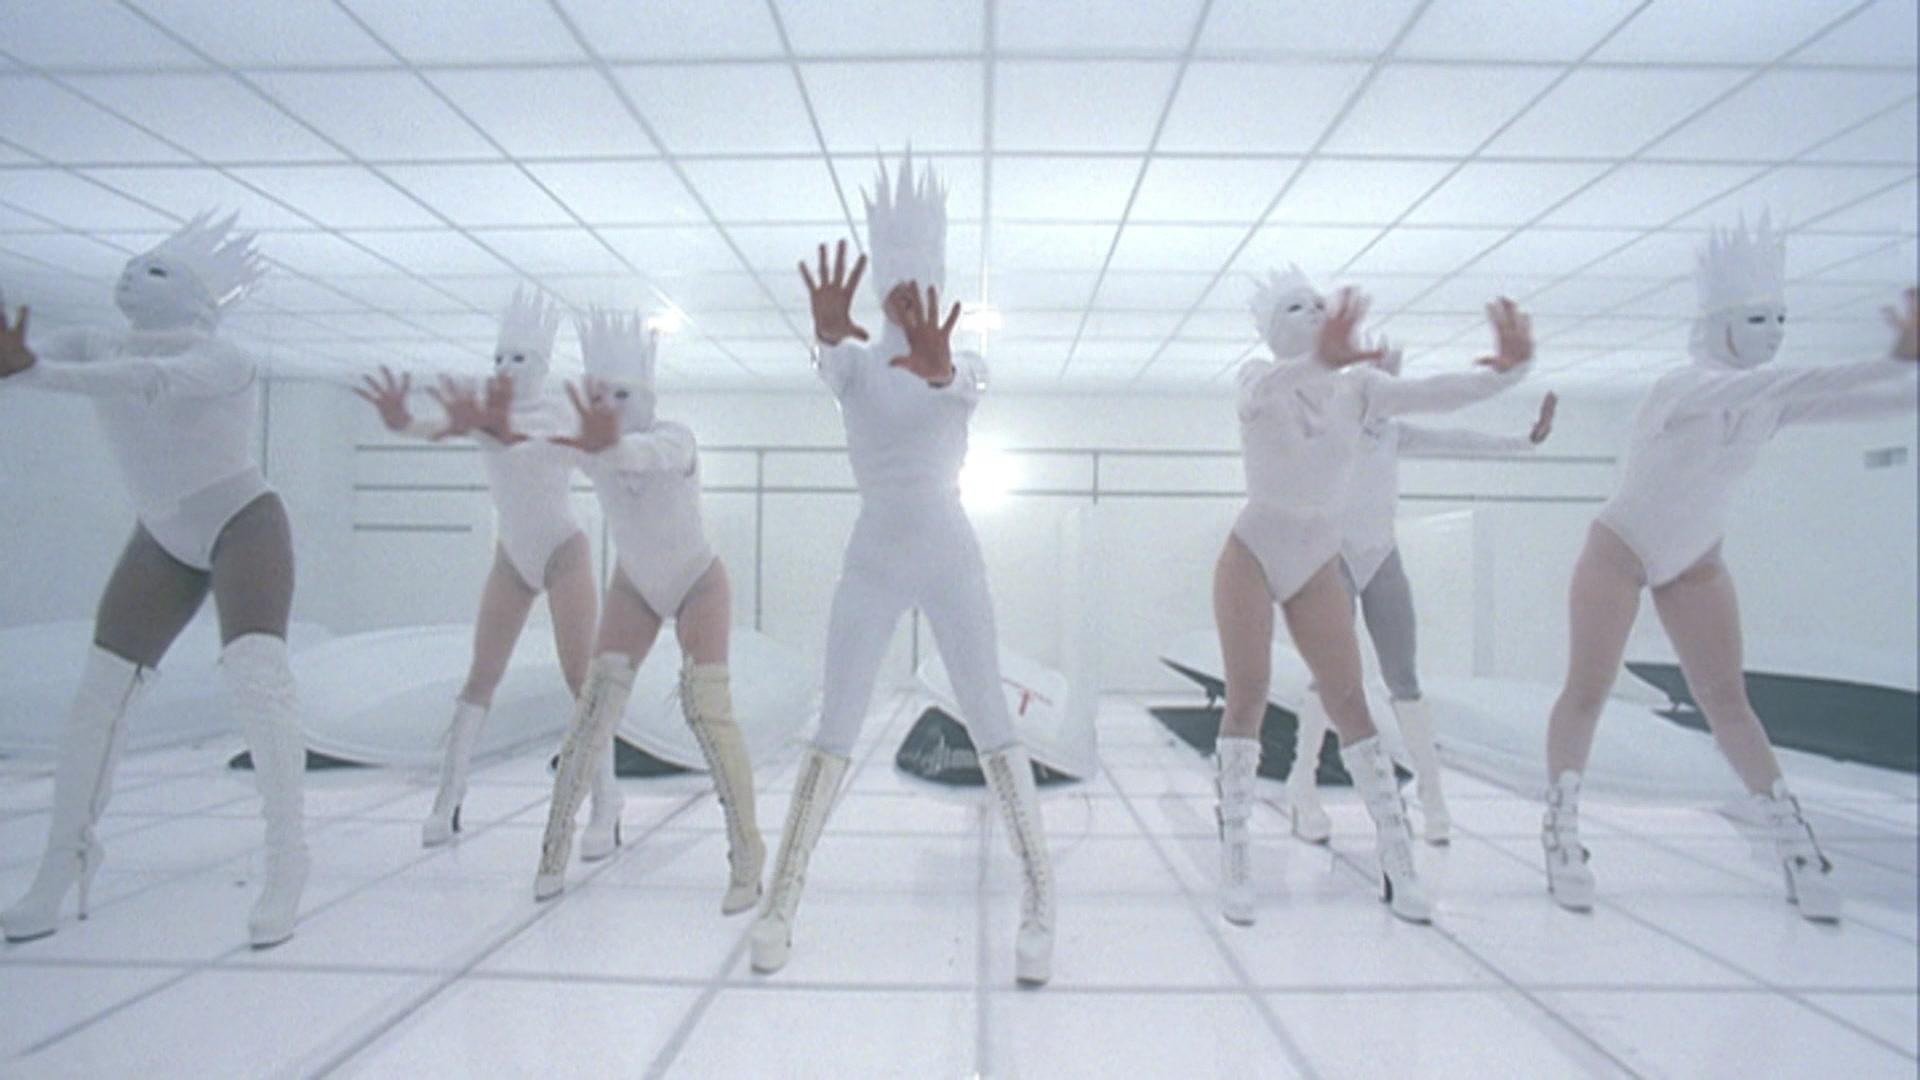 File:Lady Gaga - Bad Romance 011.jpg